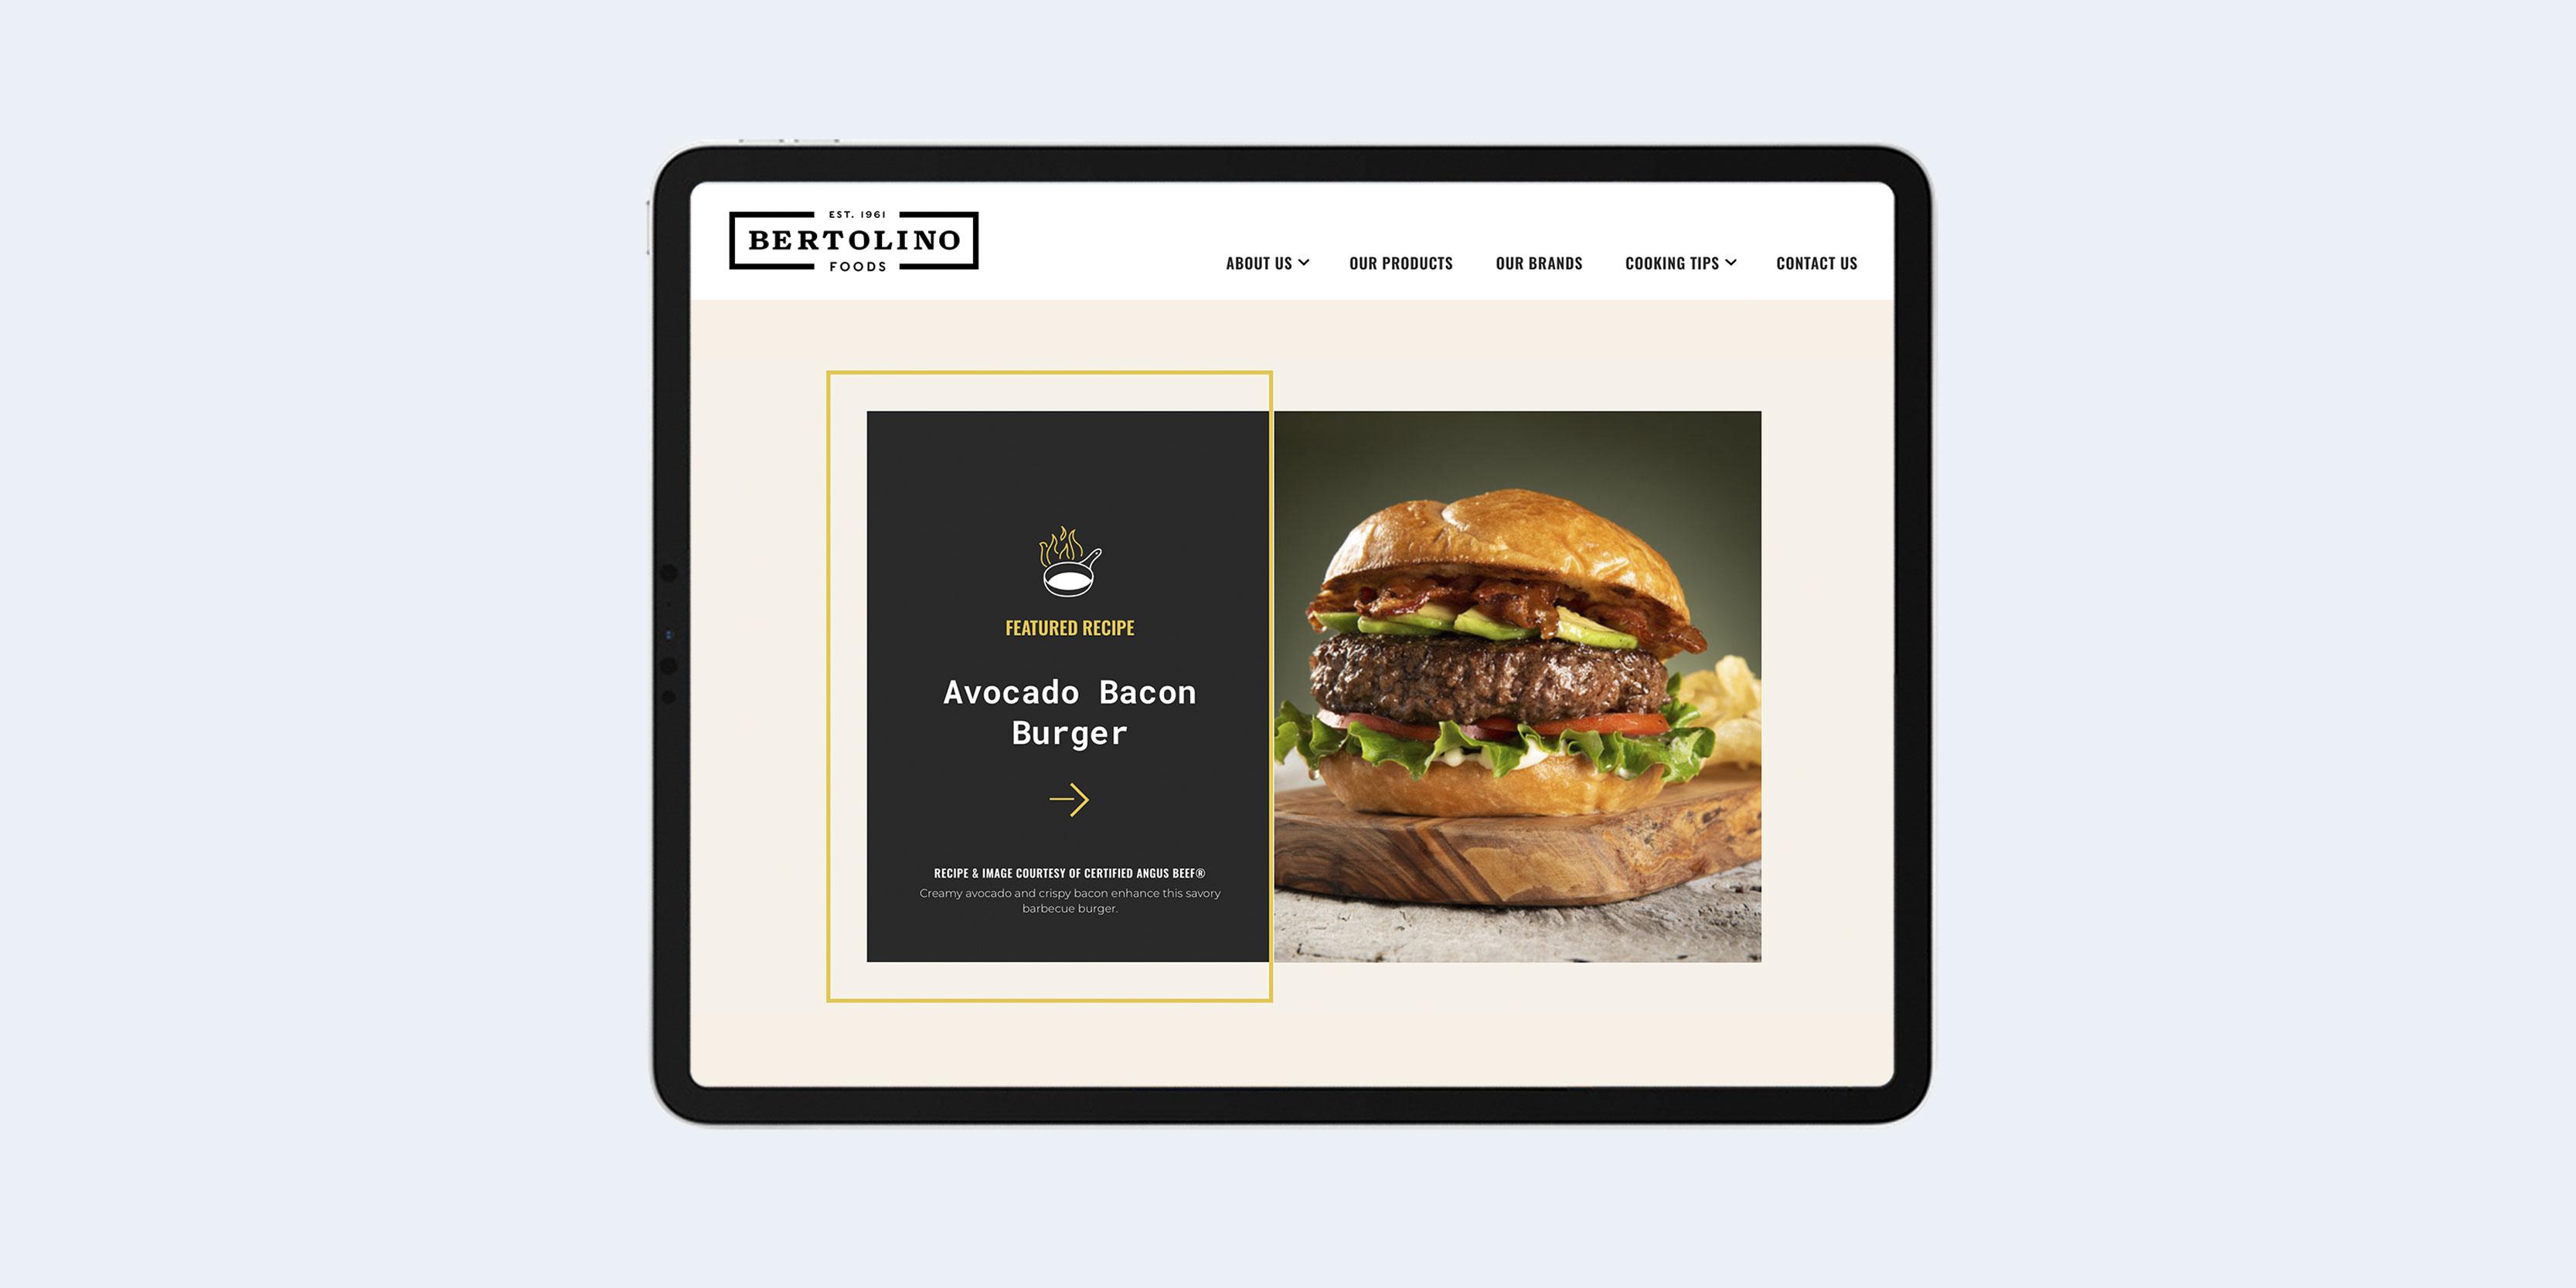 Bertolino Foods recipe page